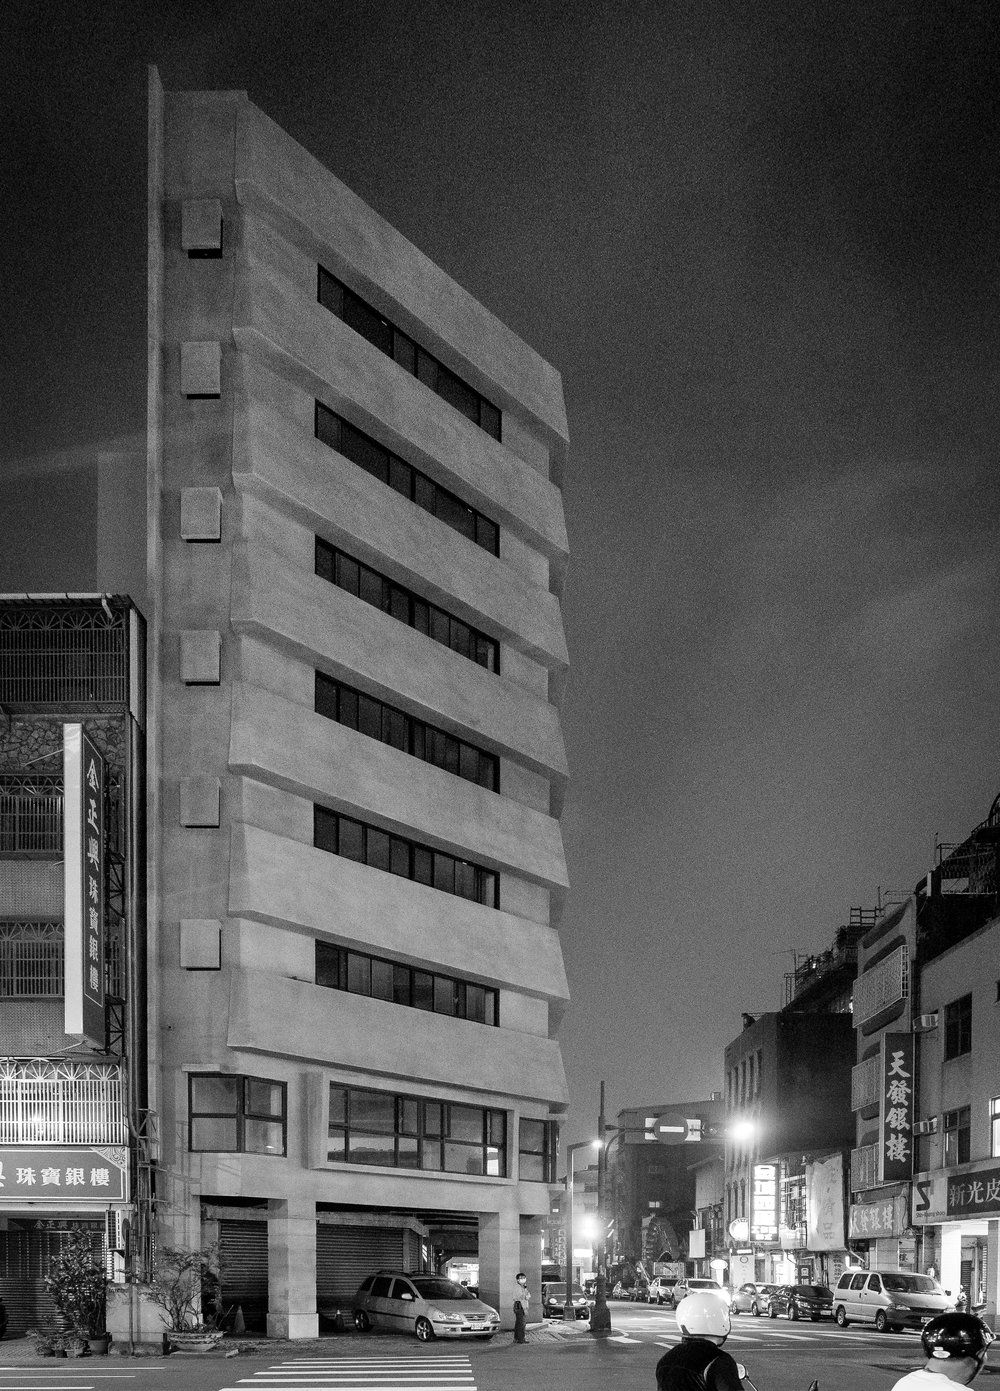 Weird corner building